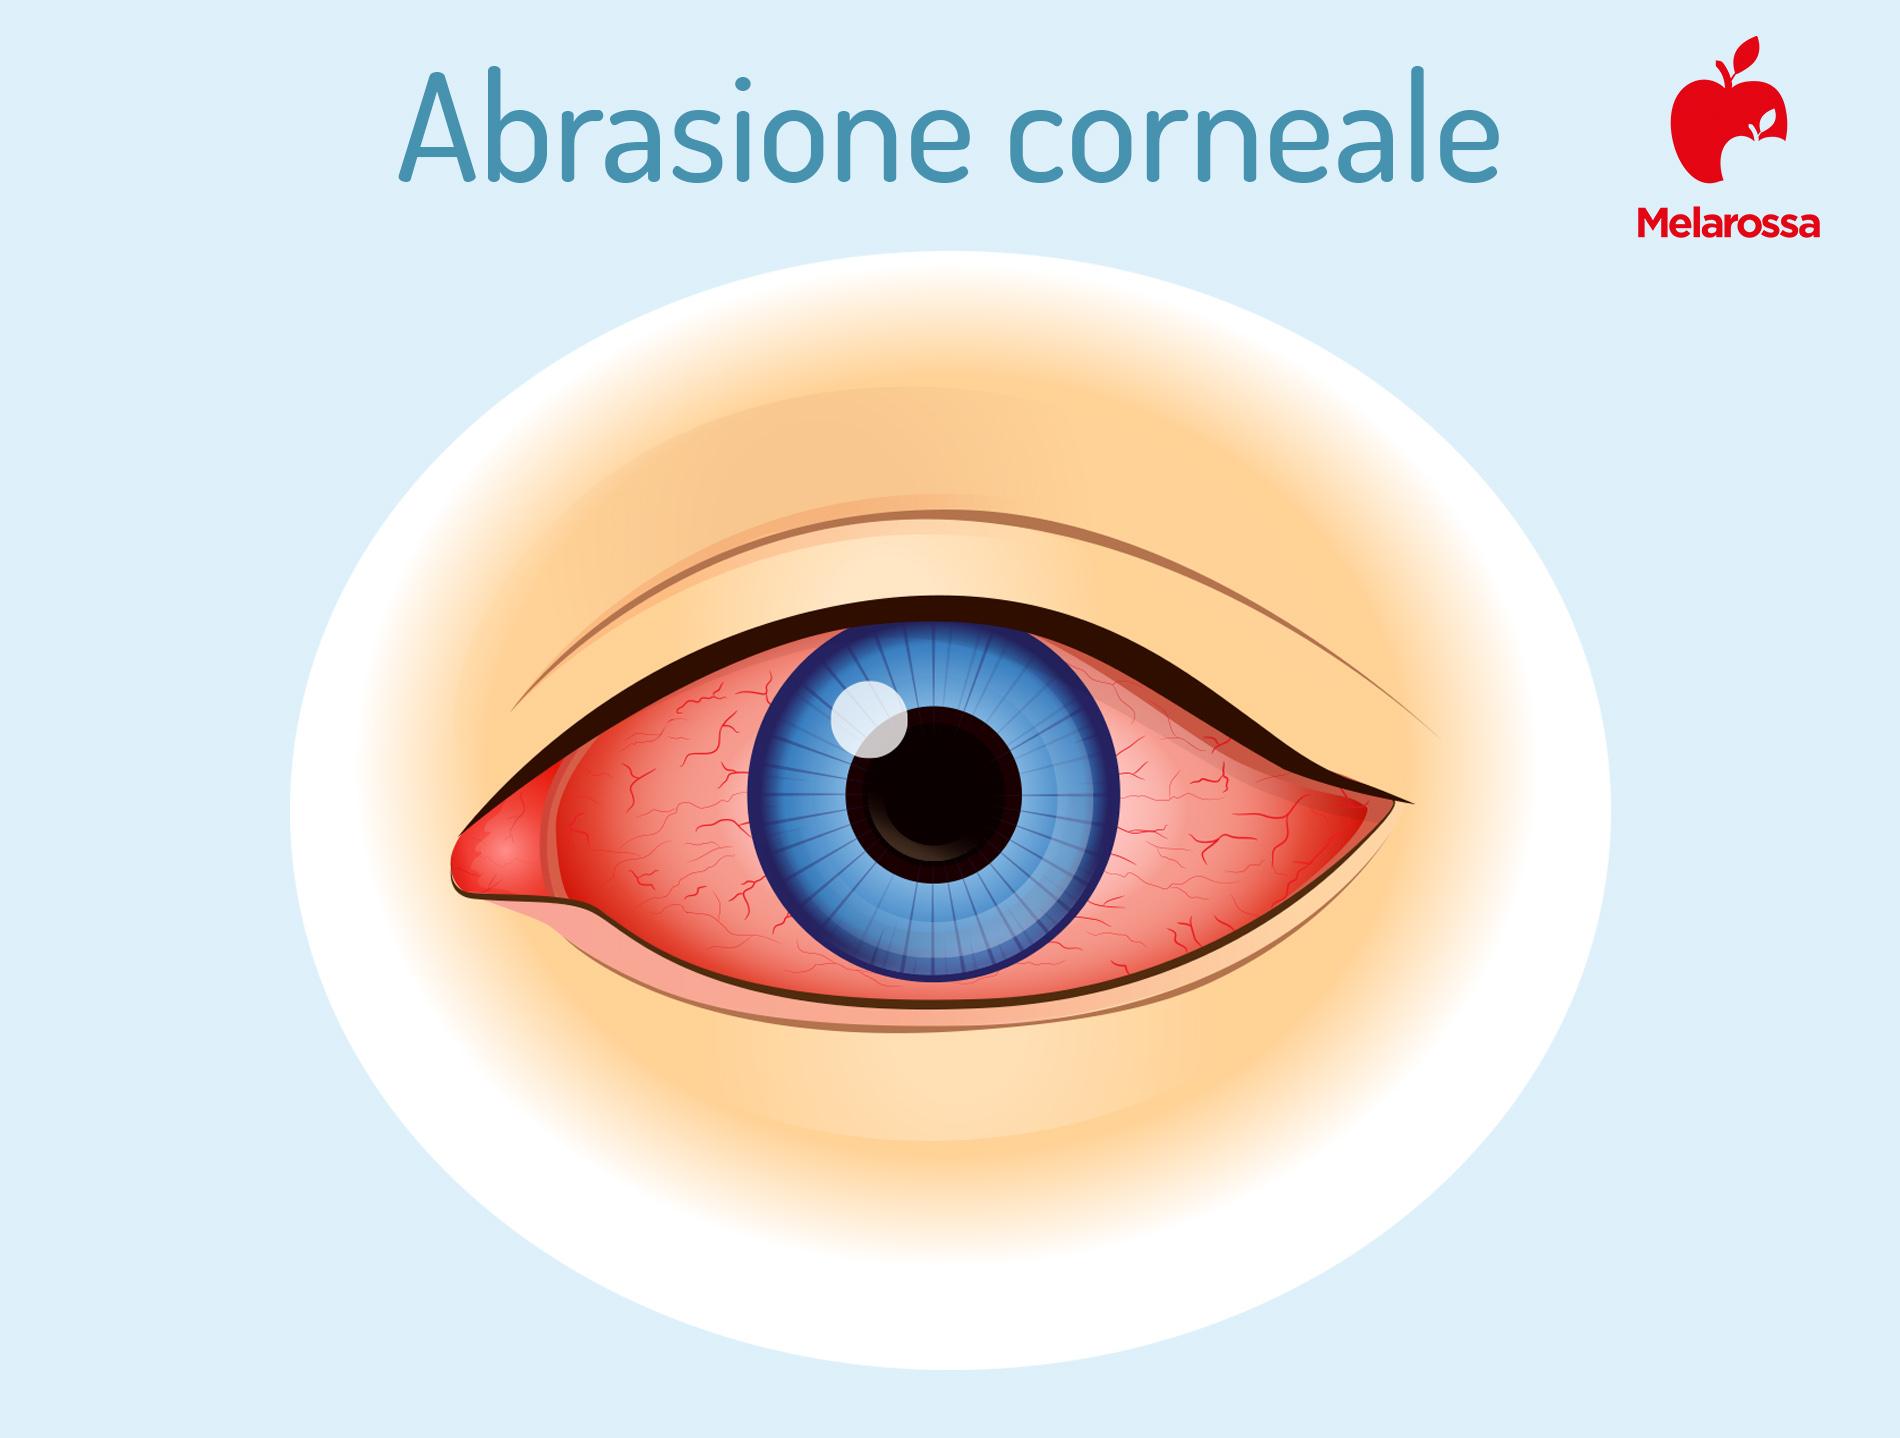 abrasione corneale: sintomi